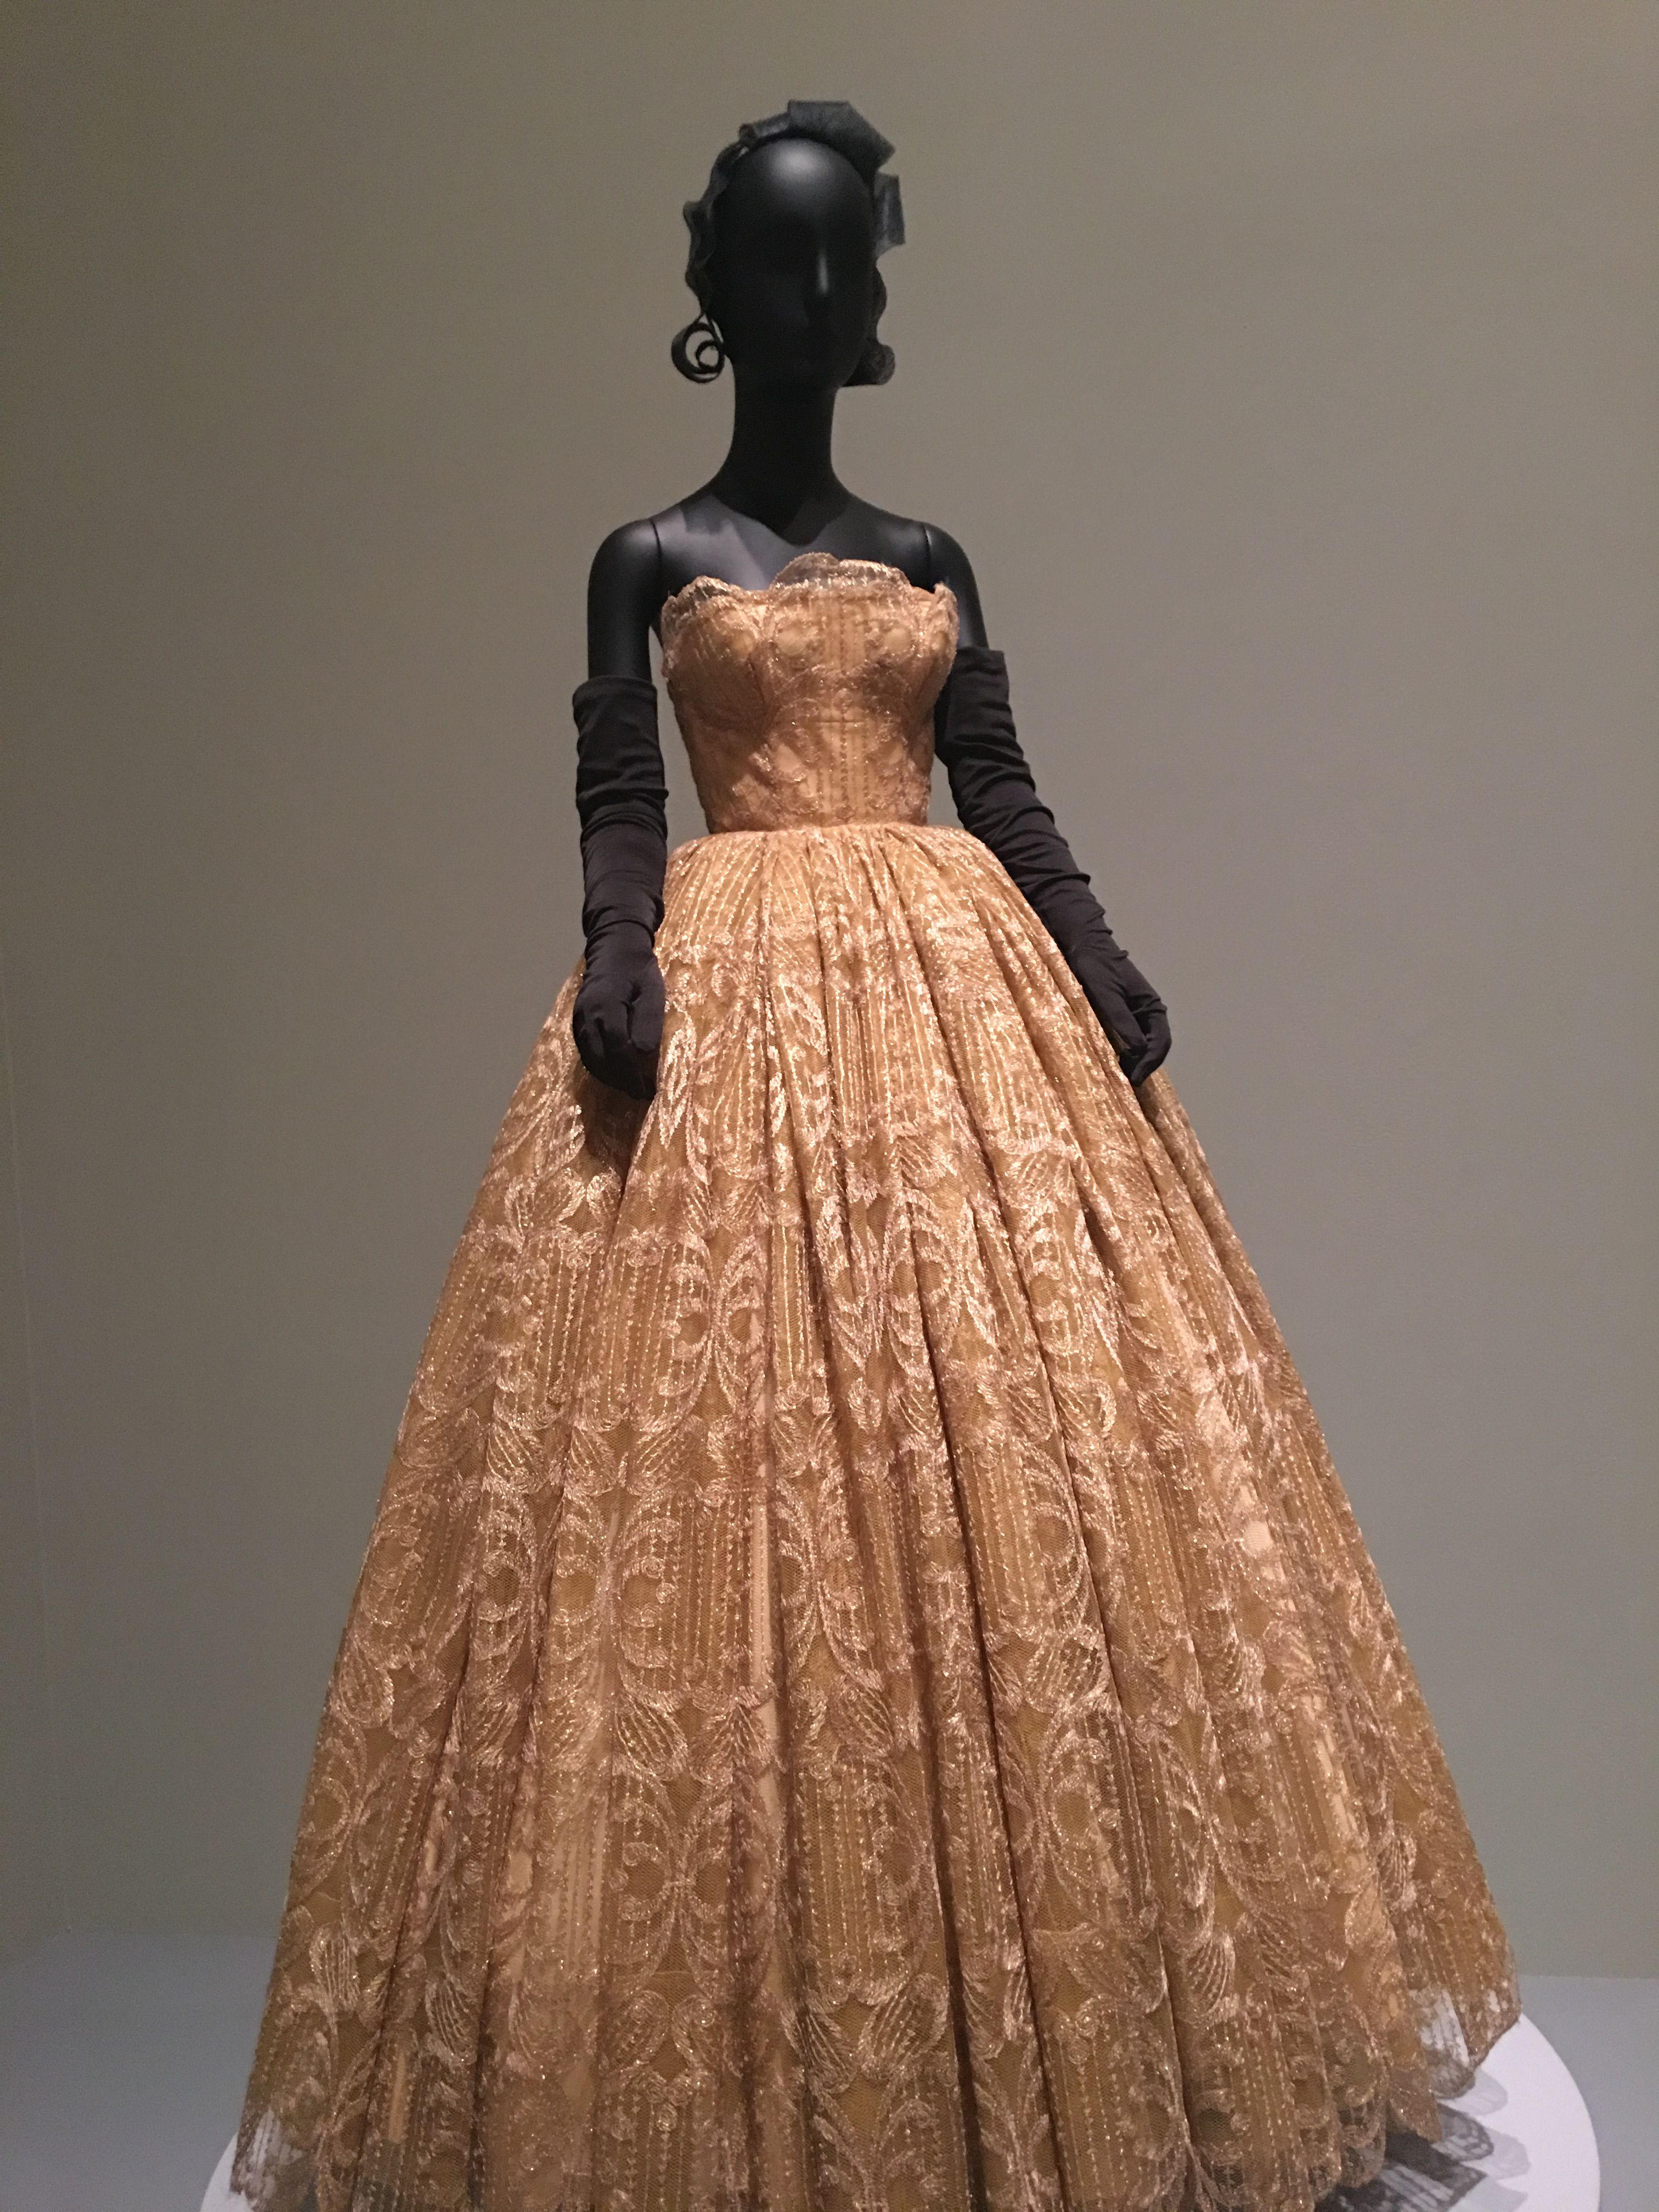 Pin By Joan Bulovas On Fun Stuff Ball Gowns Gowns Victorian Dress [ 4032 x 3024 Pixel ]